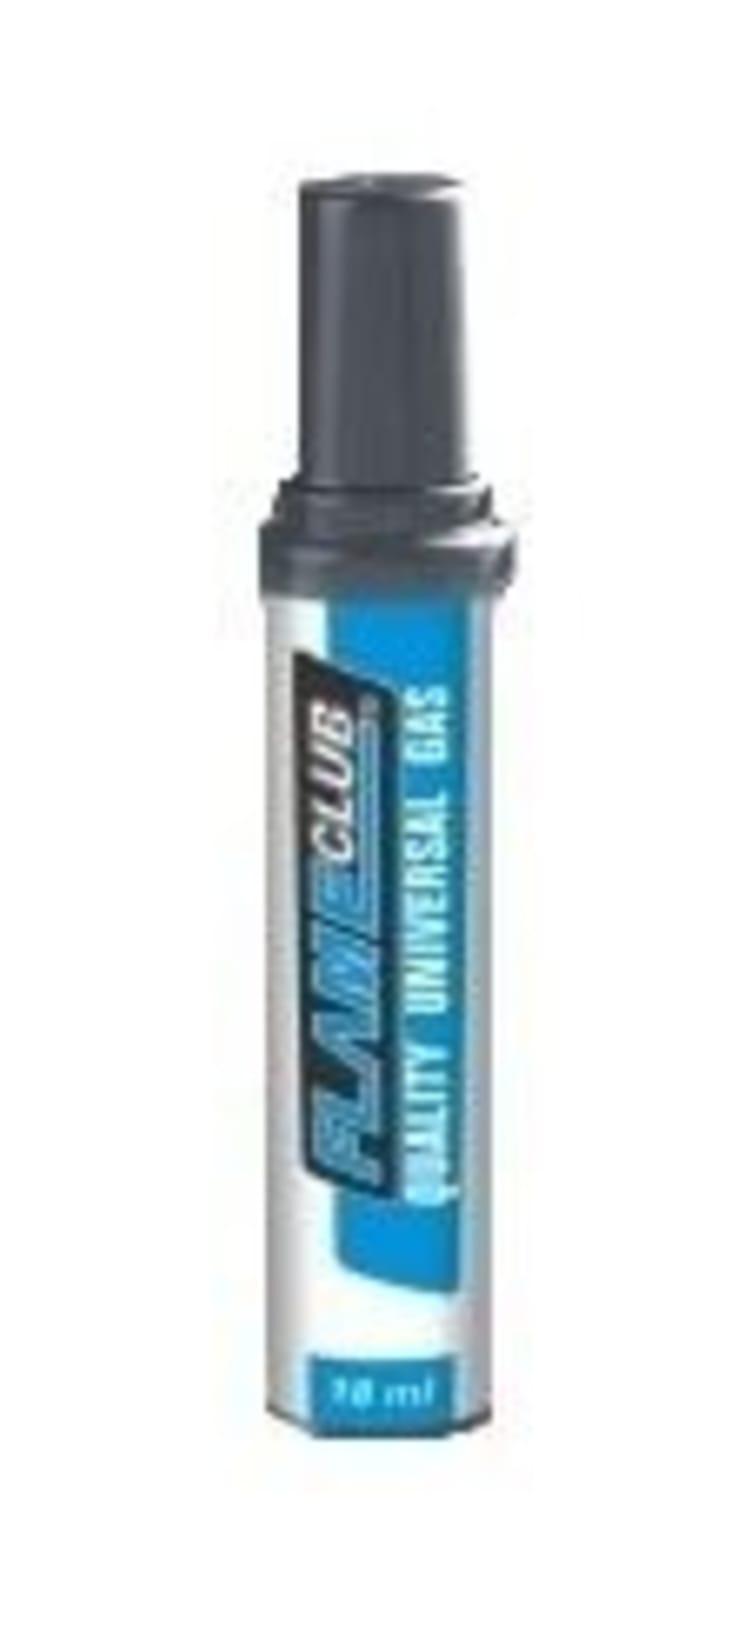 Flame Club Refill Gas 18ml - default